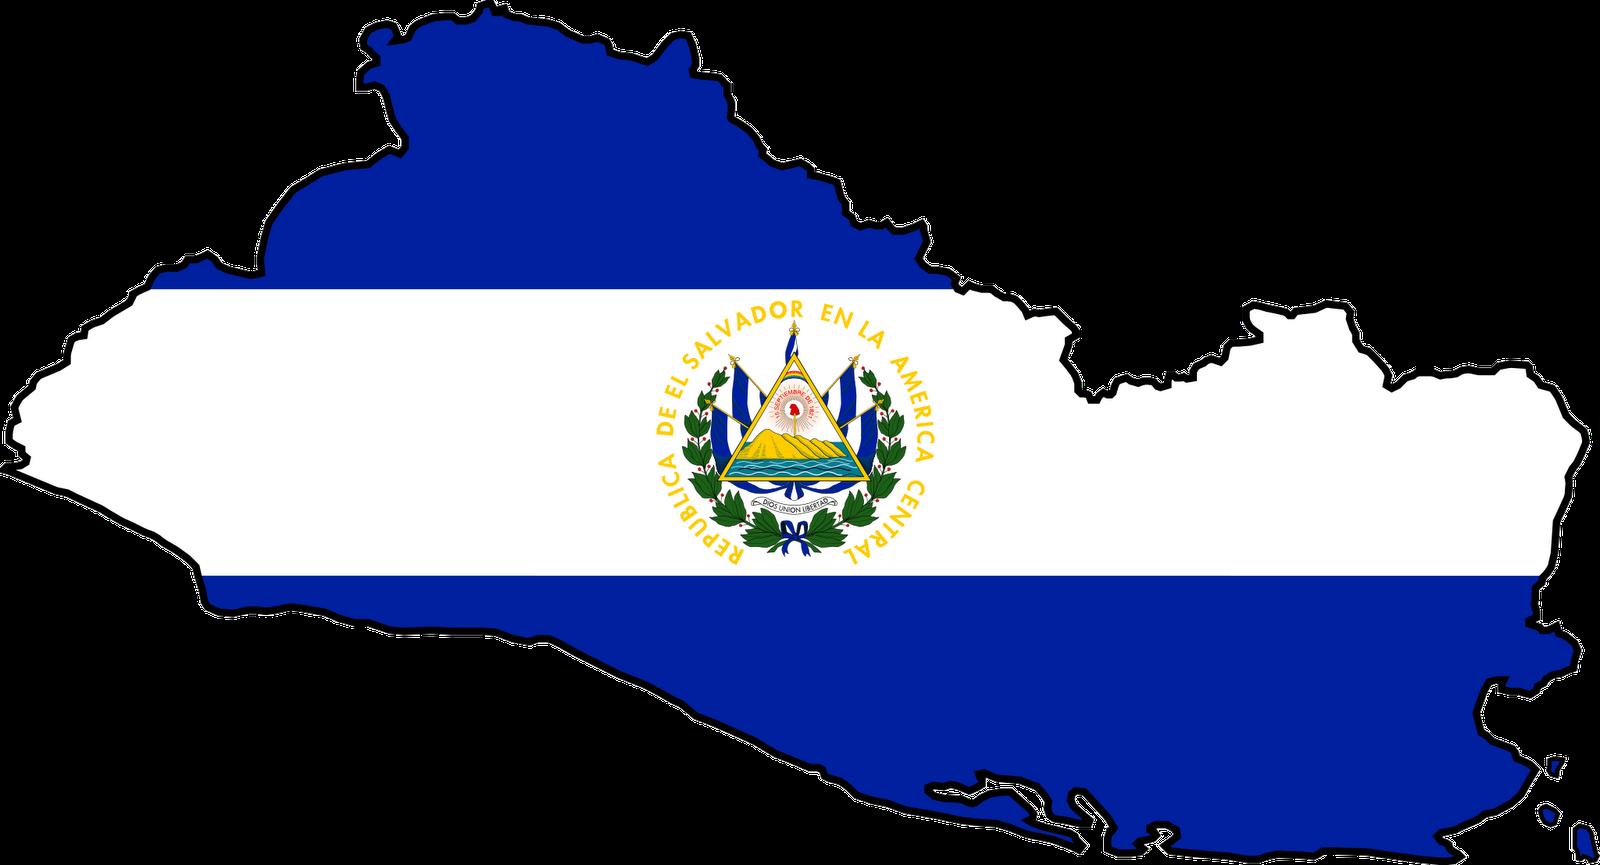 El Salvador Flag El Salvador Flag El Salvador Flag Map El Salvador Flag Icon El Salvador Flag San Salvador El Salvador